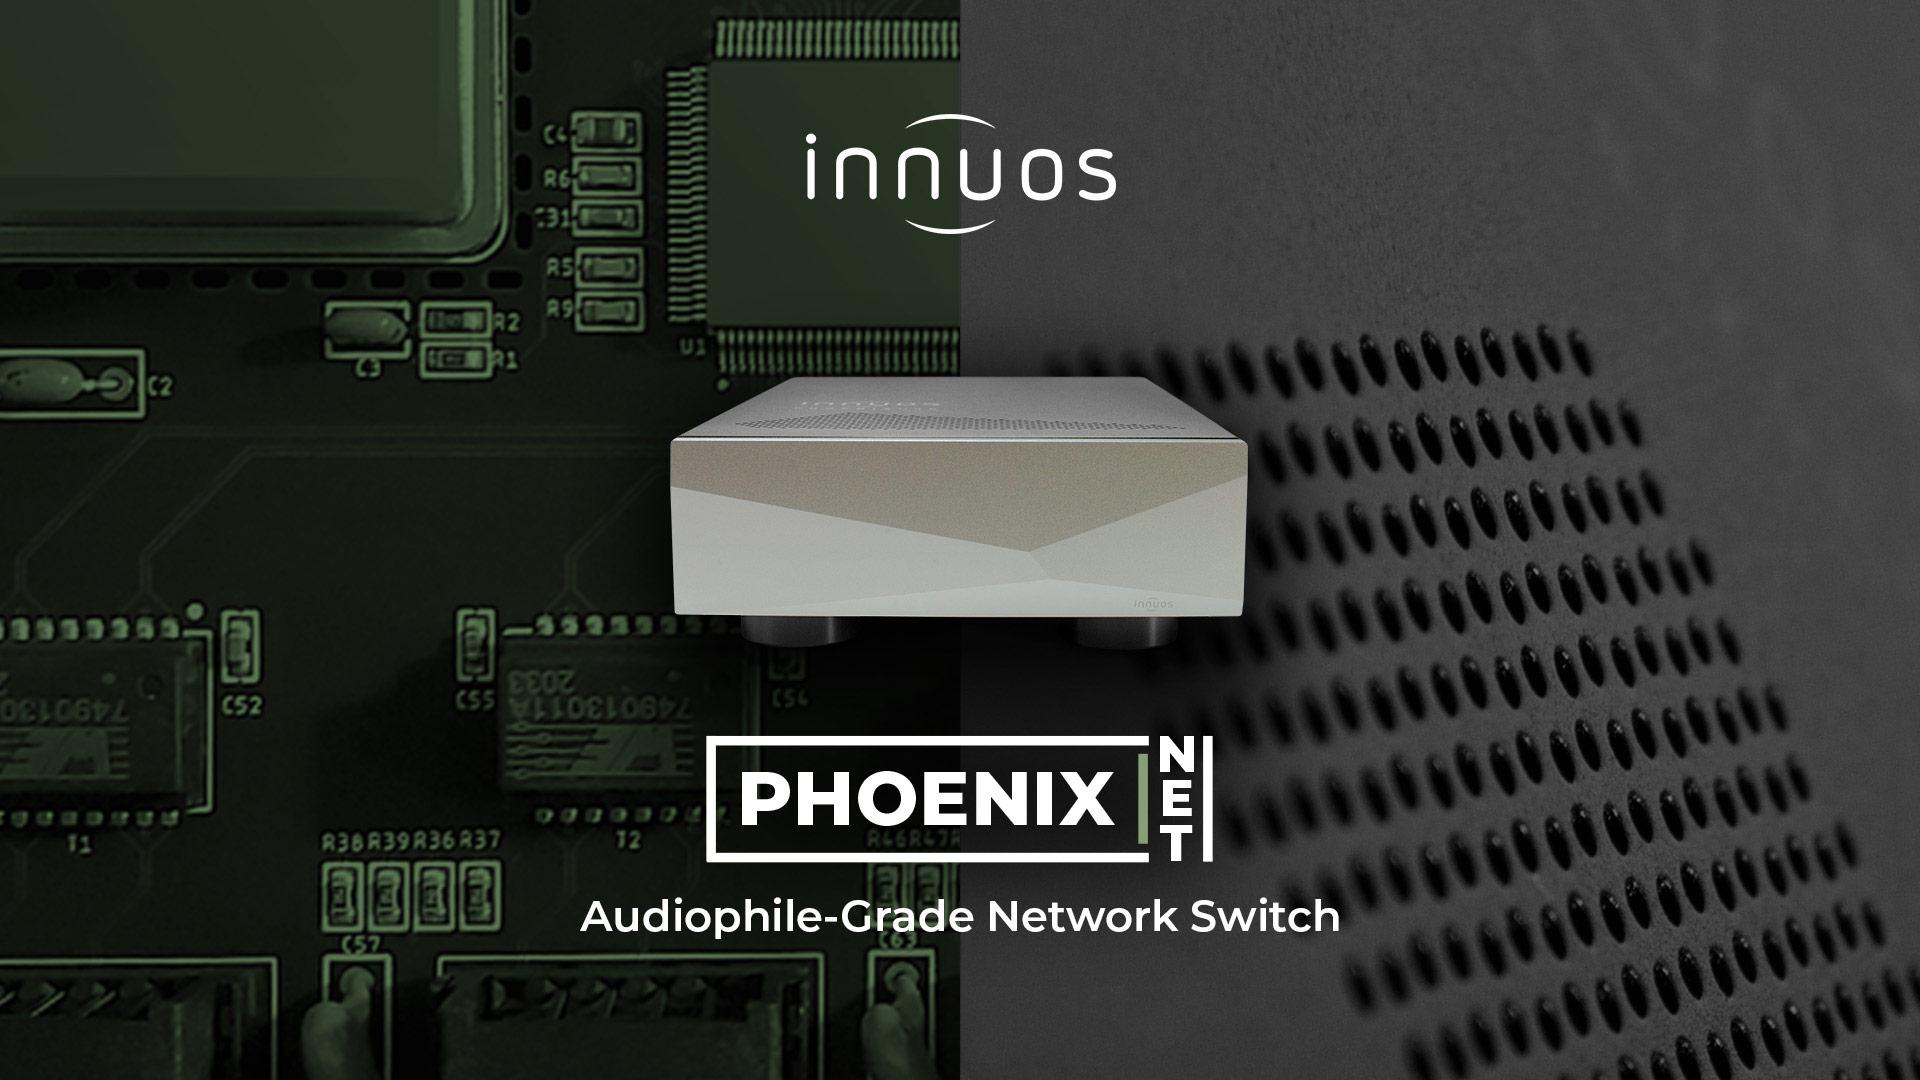 Innuos PhoenixNET Network Switch | Unilet Sound & Vision